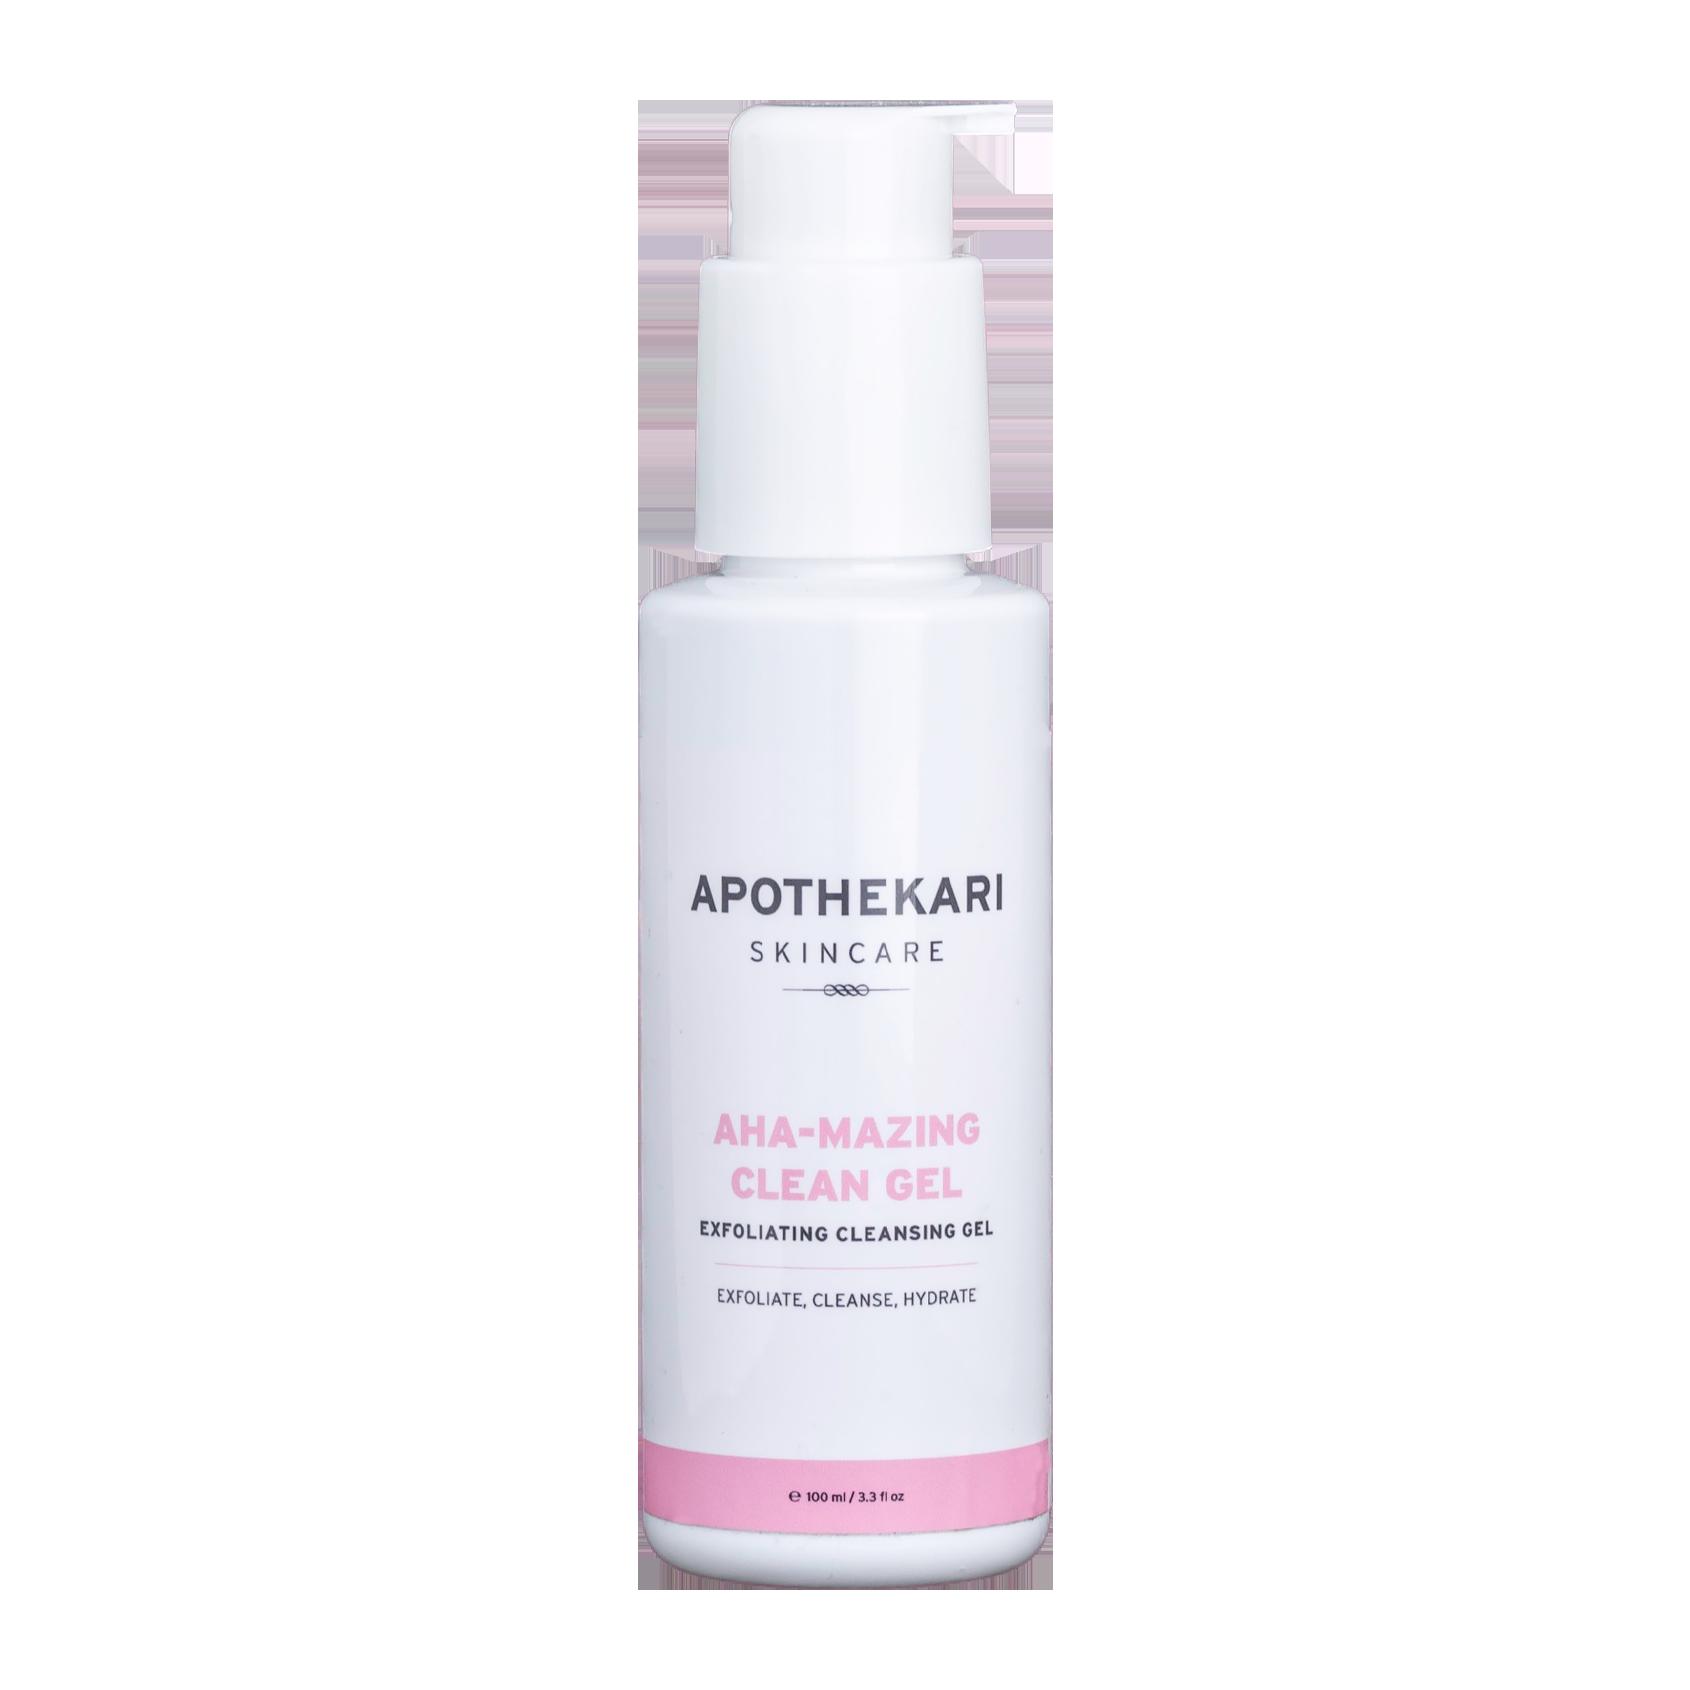 AHA-Mazing-Clean-Exfoliating-Cleansing-Gel-Apothekari-Skincare